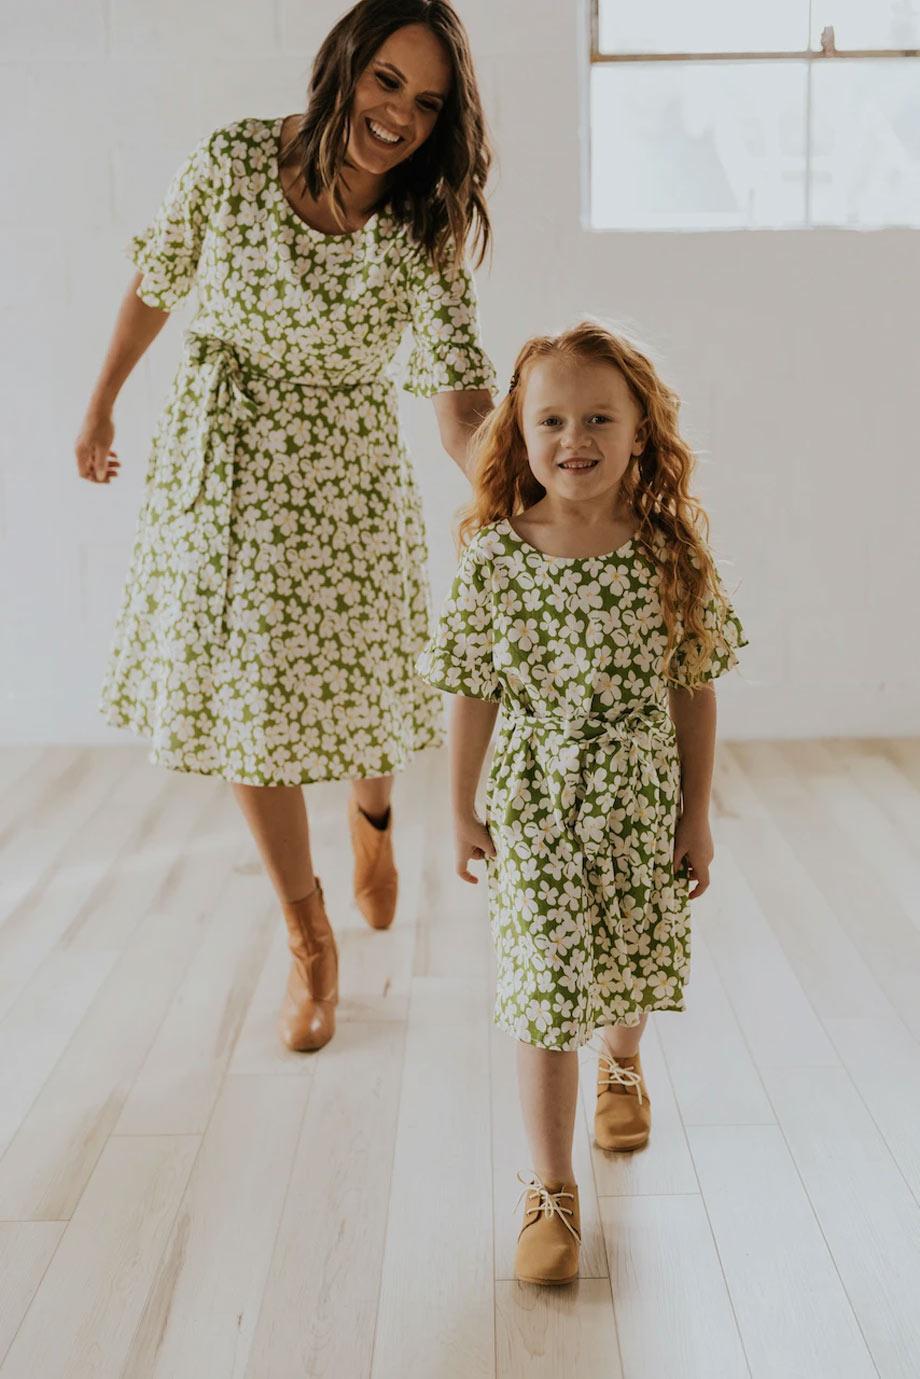 Green floral dresses